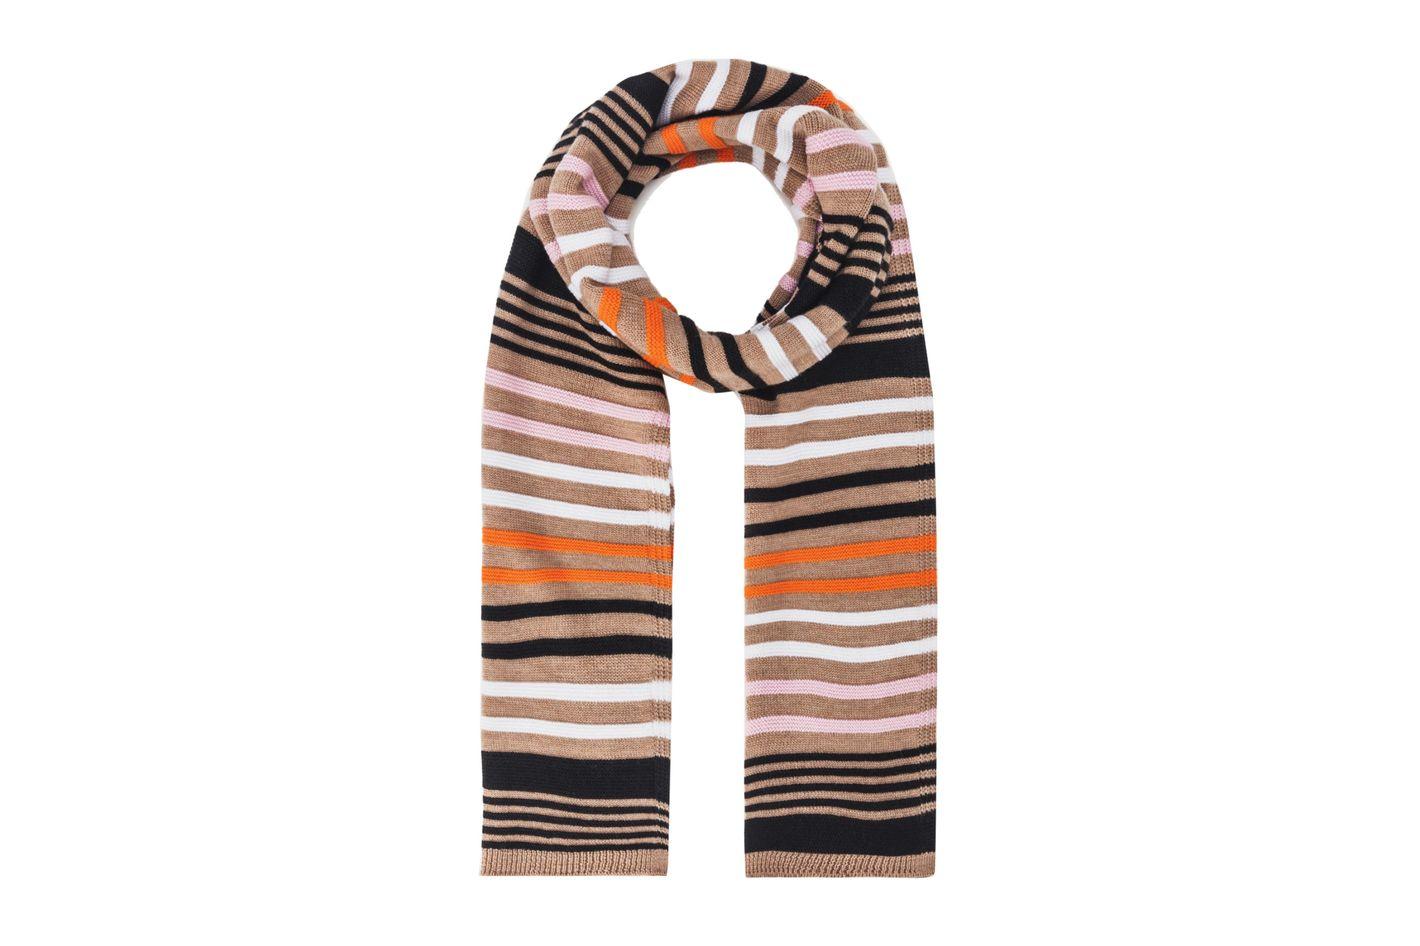 Sonia Rykiel Multicolour-Striped Scarf